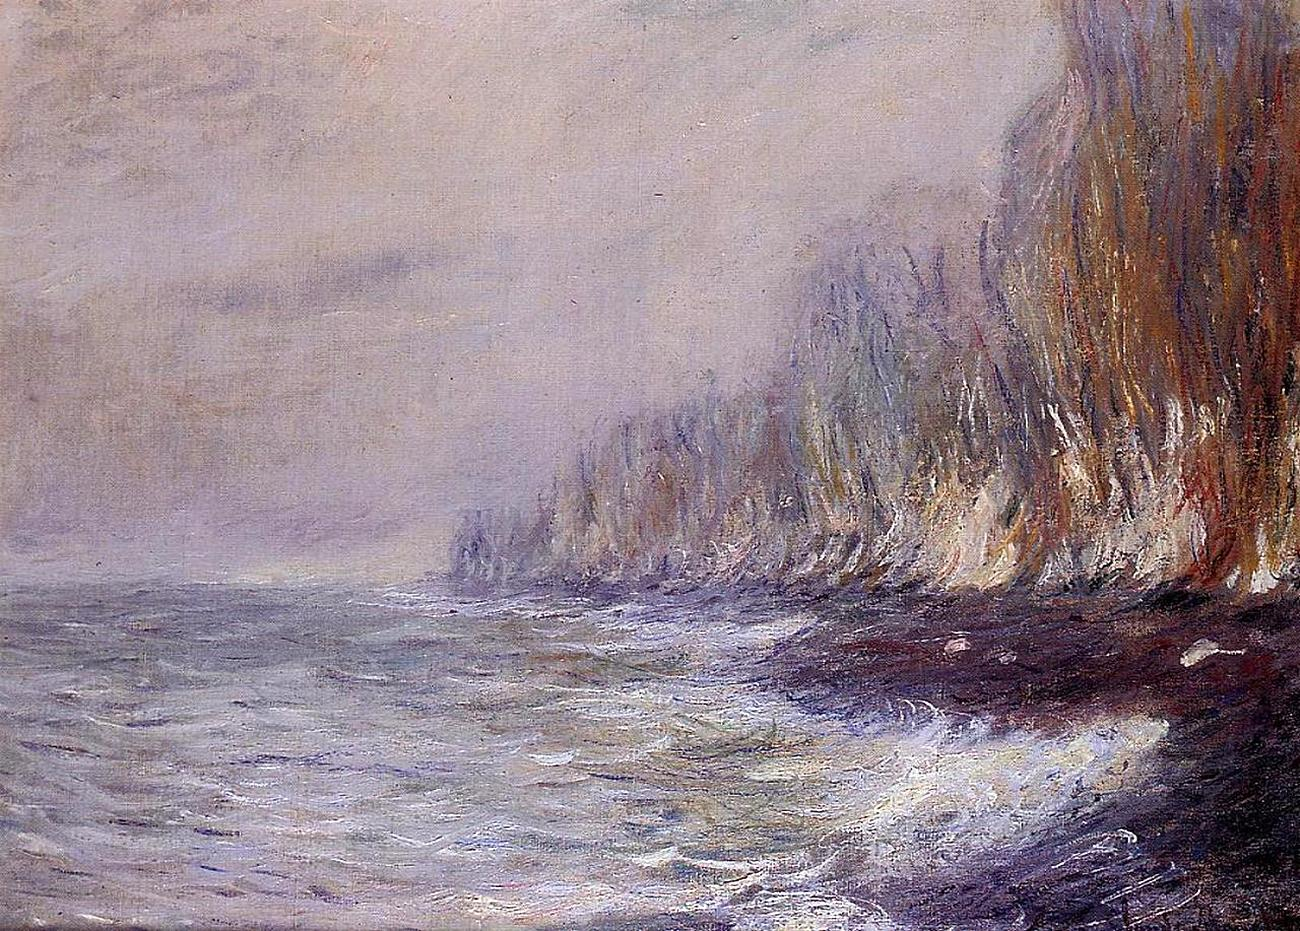 пейзажи - побережье < Туман близ Дьепа >:: Клод Моне, описание картины - Claude Monet фото